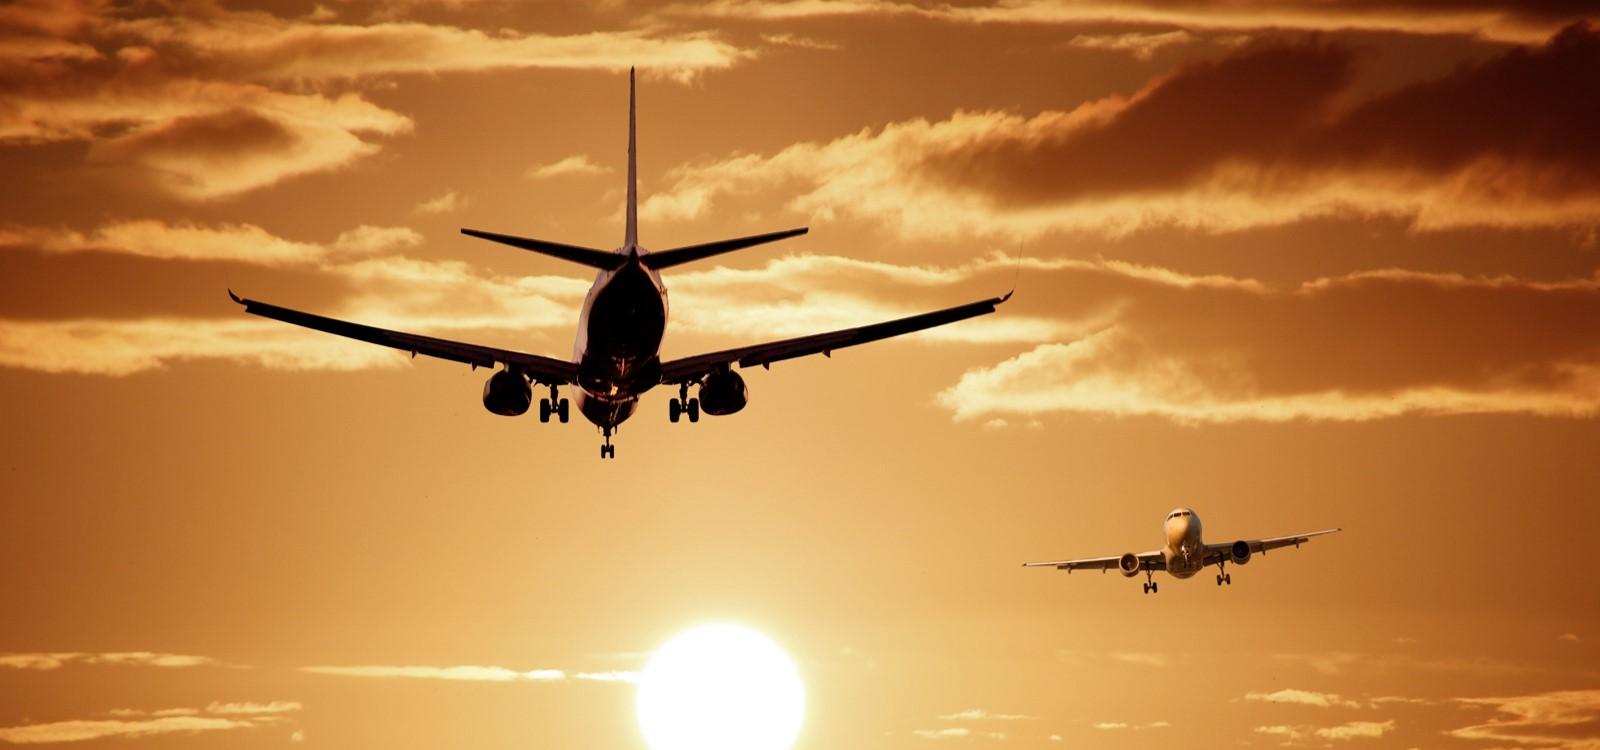 slider odyssea avion voyage